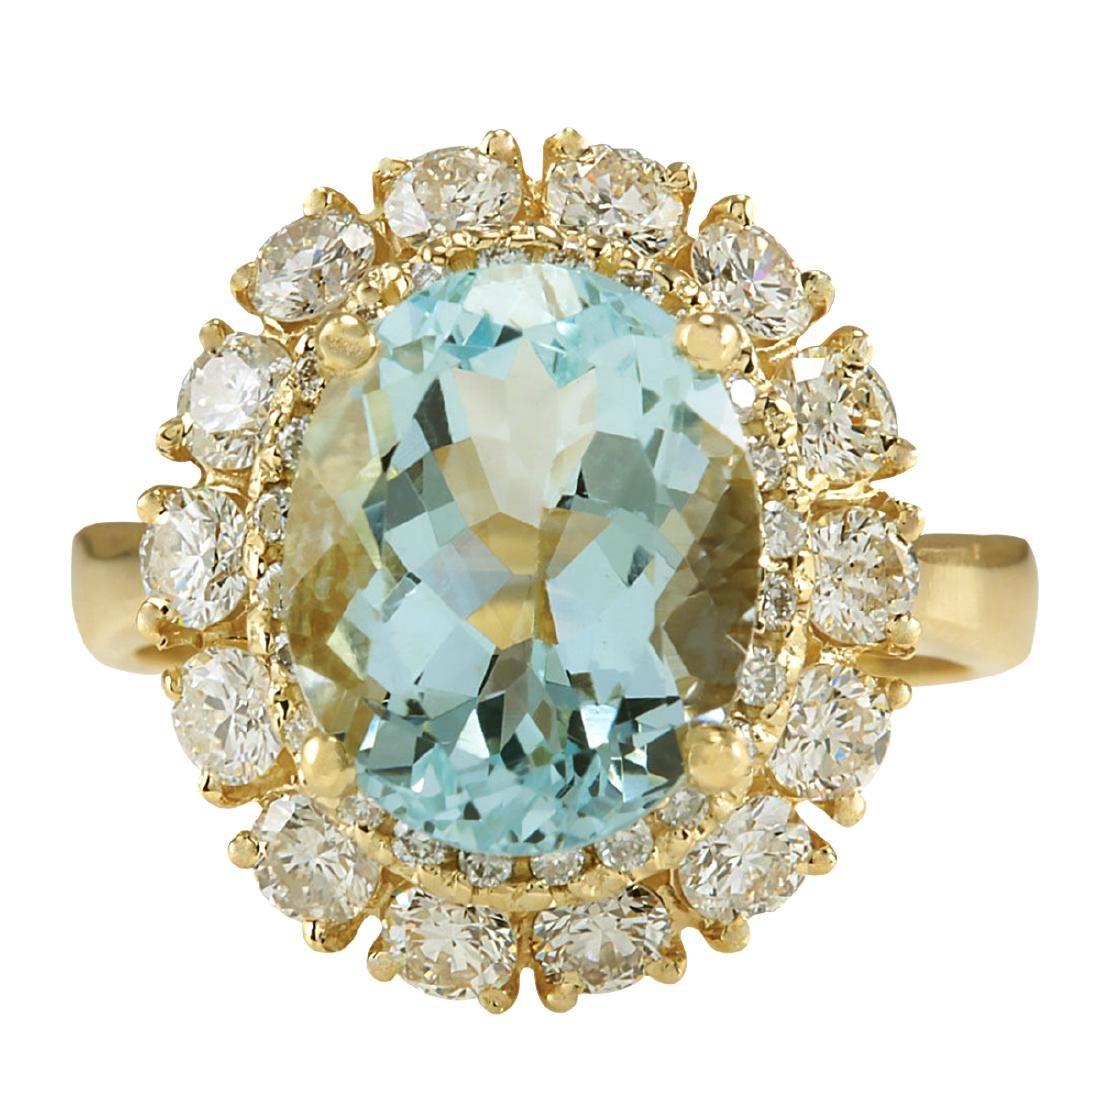 5.15CTW Natural Blue Aquamarine And Diamond Ring In 18K